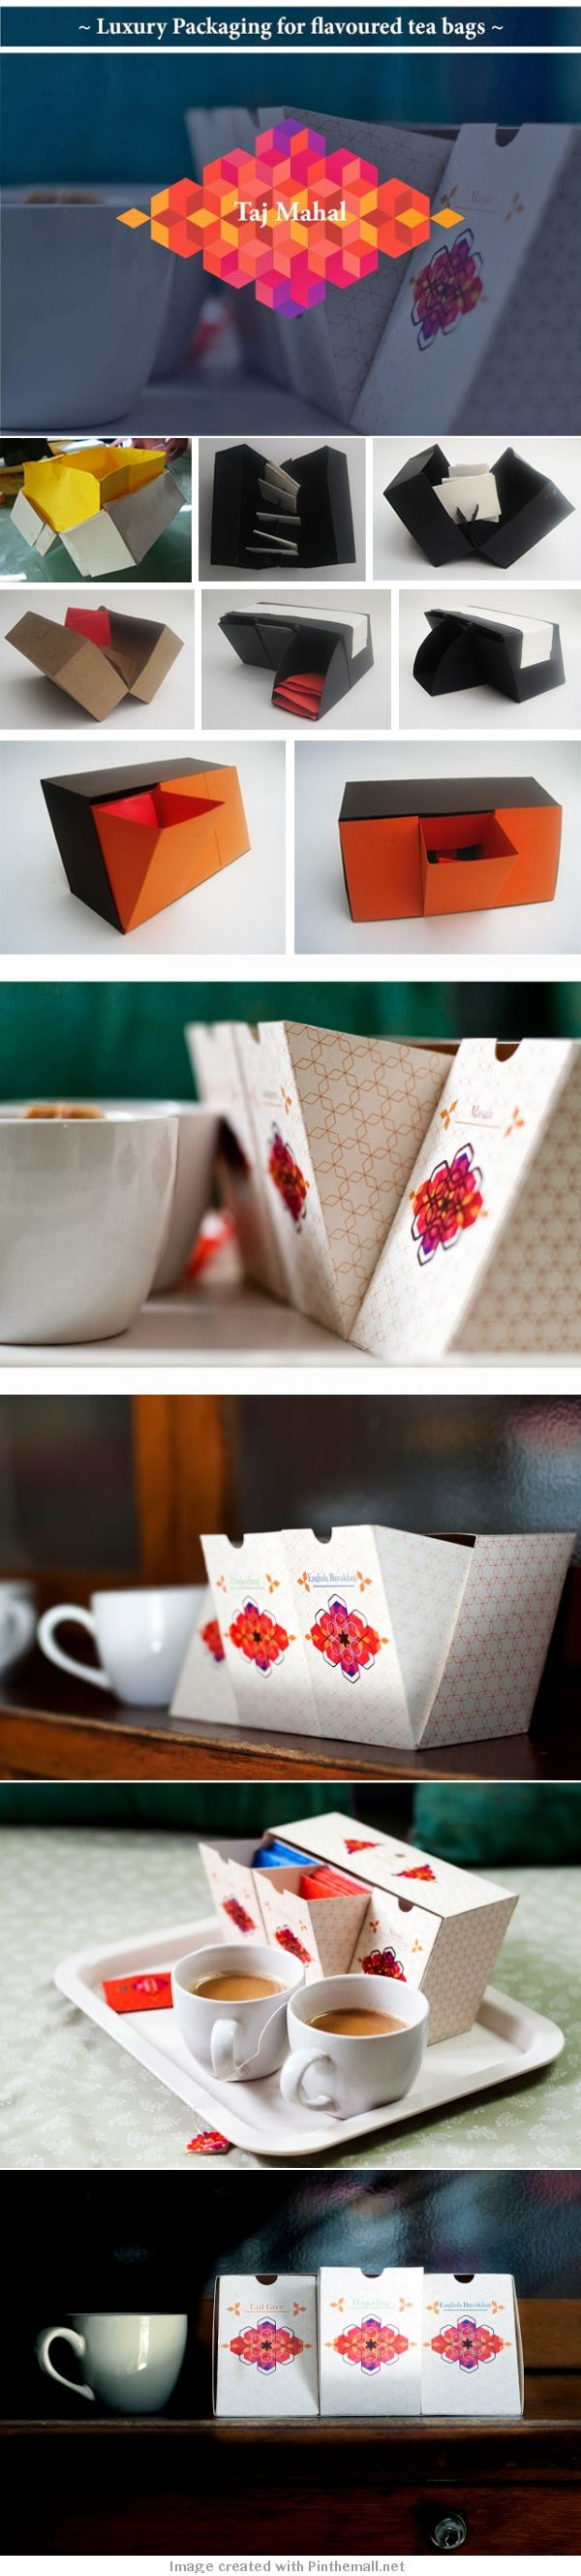 Taj Mahal Tea (Student Project) intriguing tea bag #packaging PD